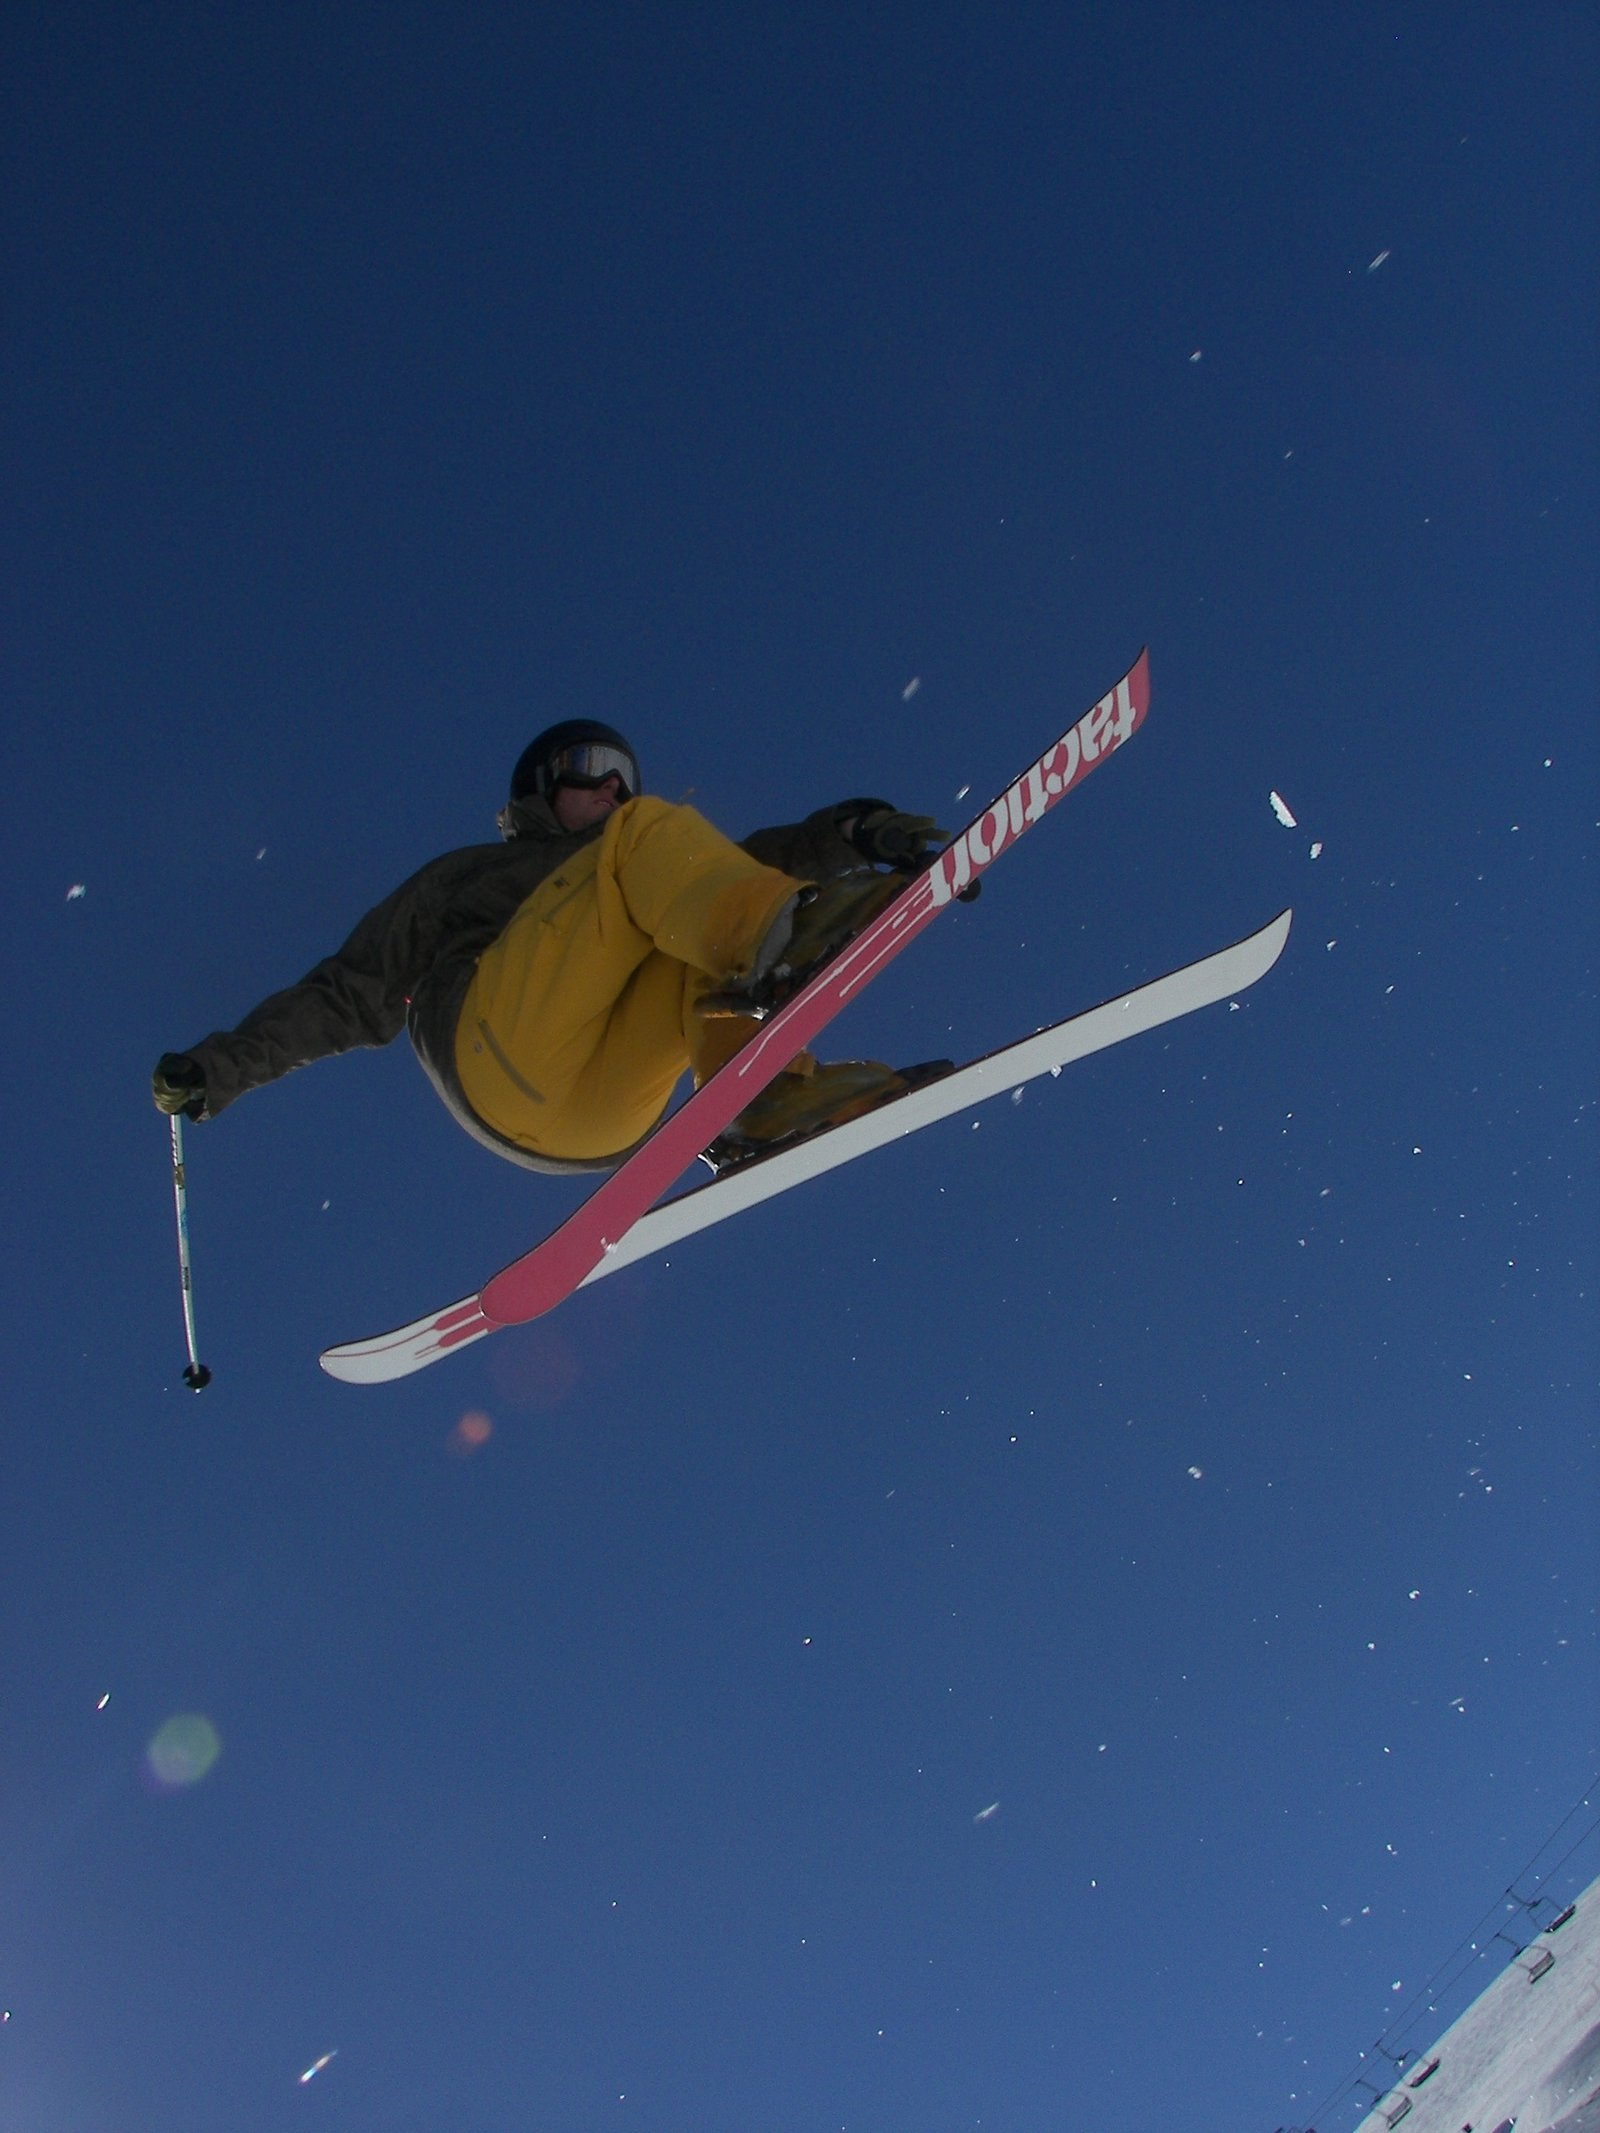 Ski jump! wow!